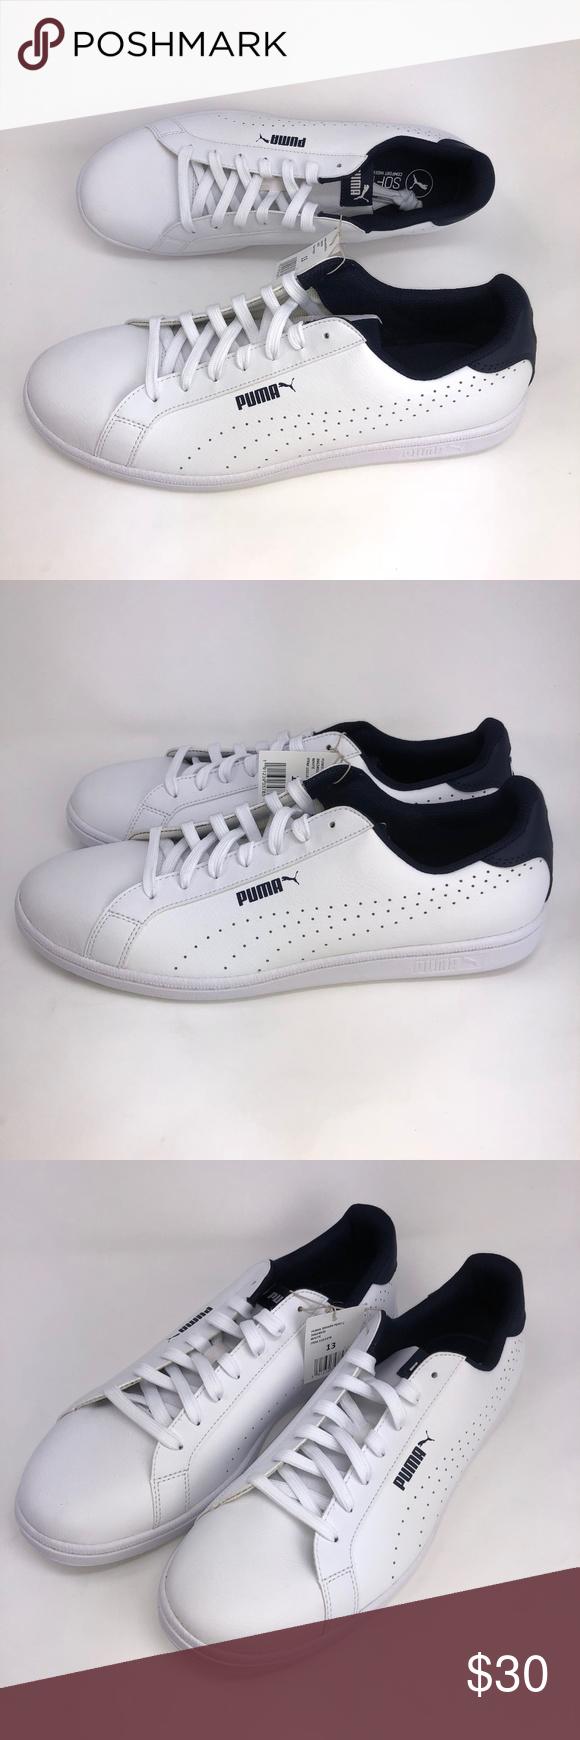 Puma Smash Perf C Mens Sneaker Tennis Shoes White Puma Smash Perf C Mens Sneak Source by tennisfit0784 shoes outfit